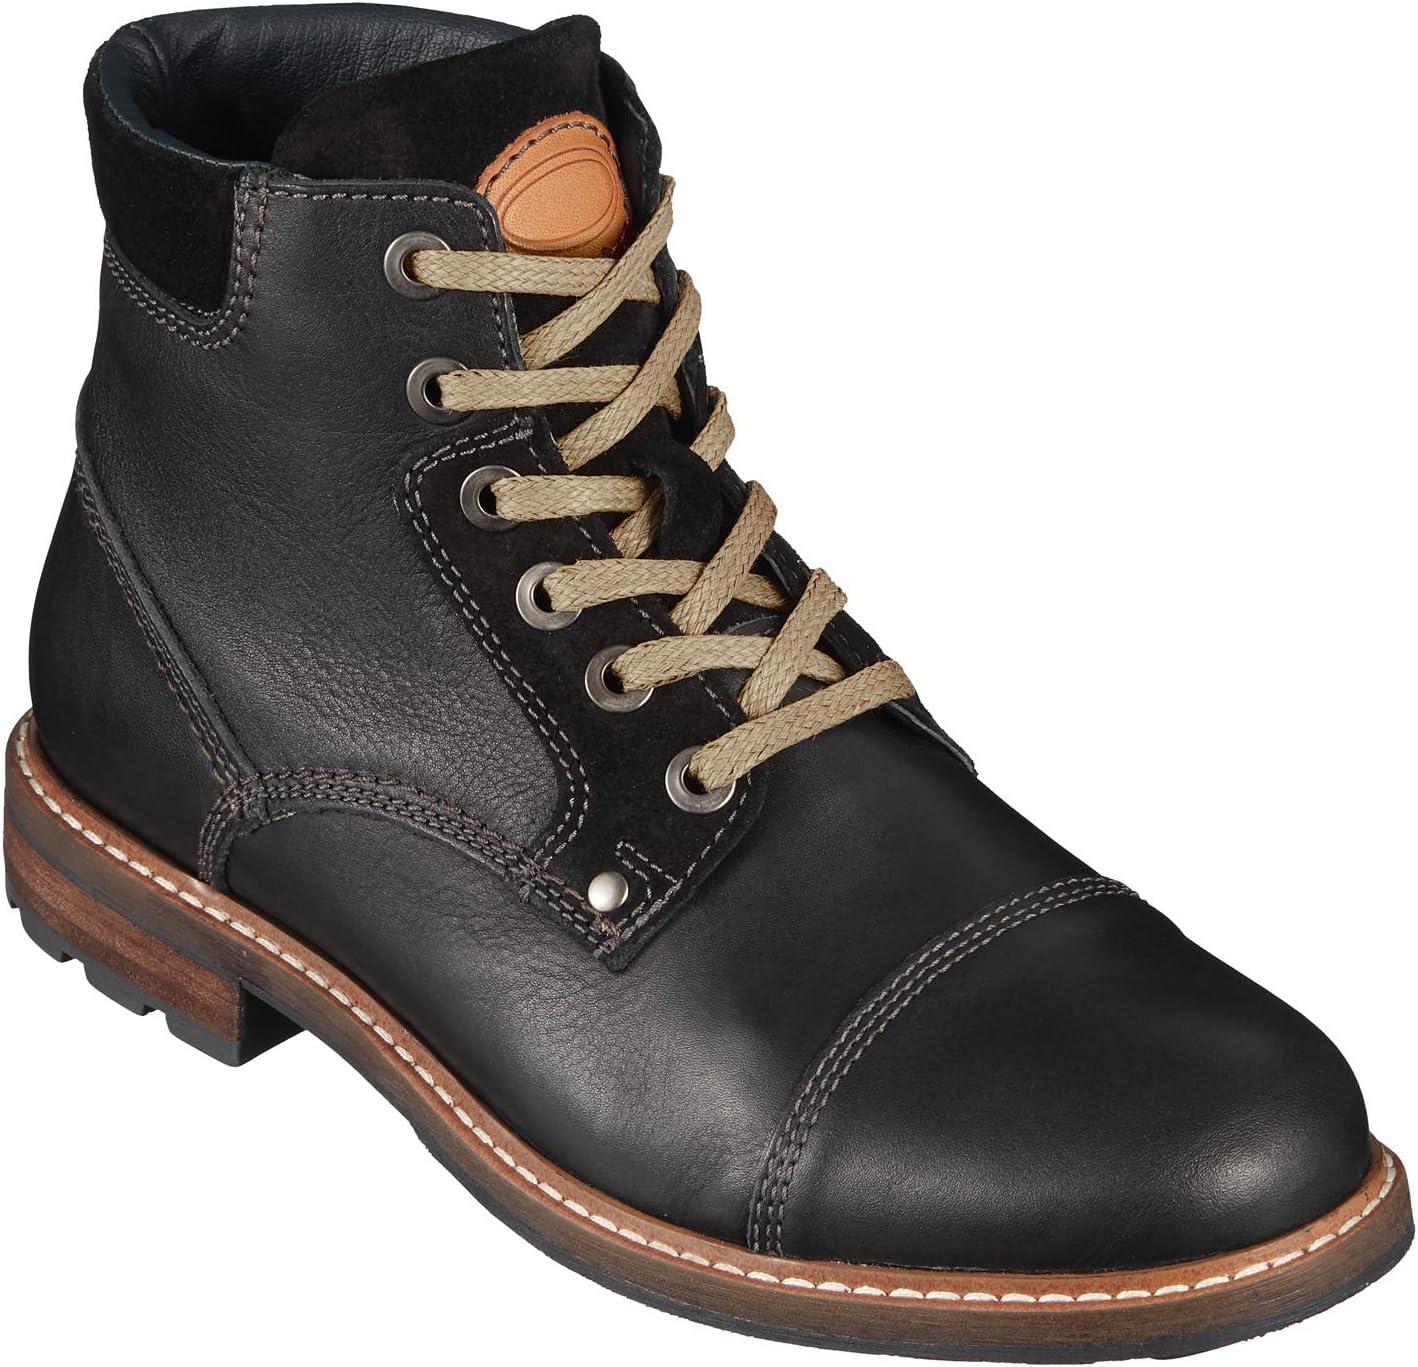 Di Ficchiano Schuhb/änder I rei/ßfester Schn/ürsenkel flach /ø 5 mm aus feiner Baumwolle//gewachst I Shoelaces f/ür Sportschuhe Lederschuhe Sneaker UVM L/ängen 70-140 cm